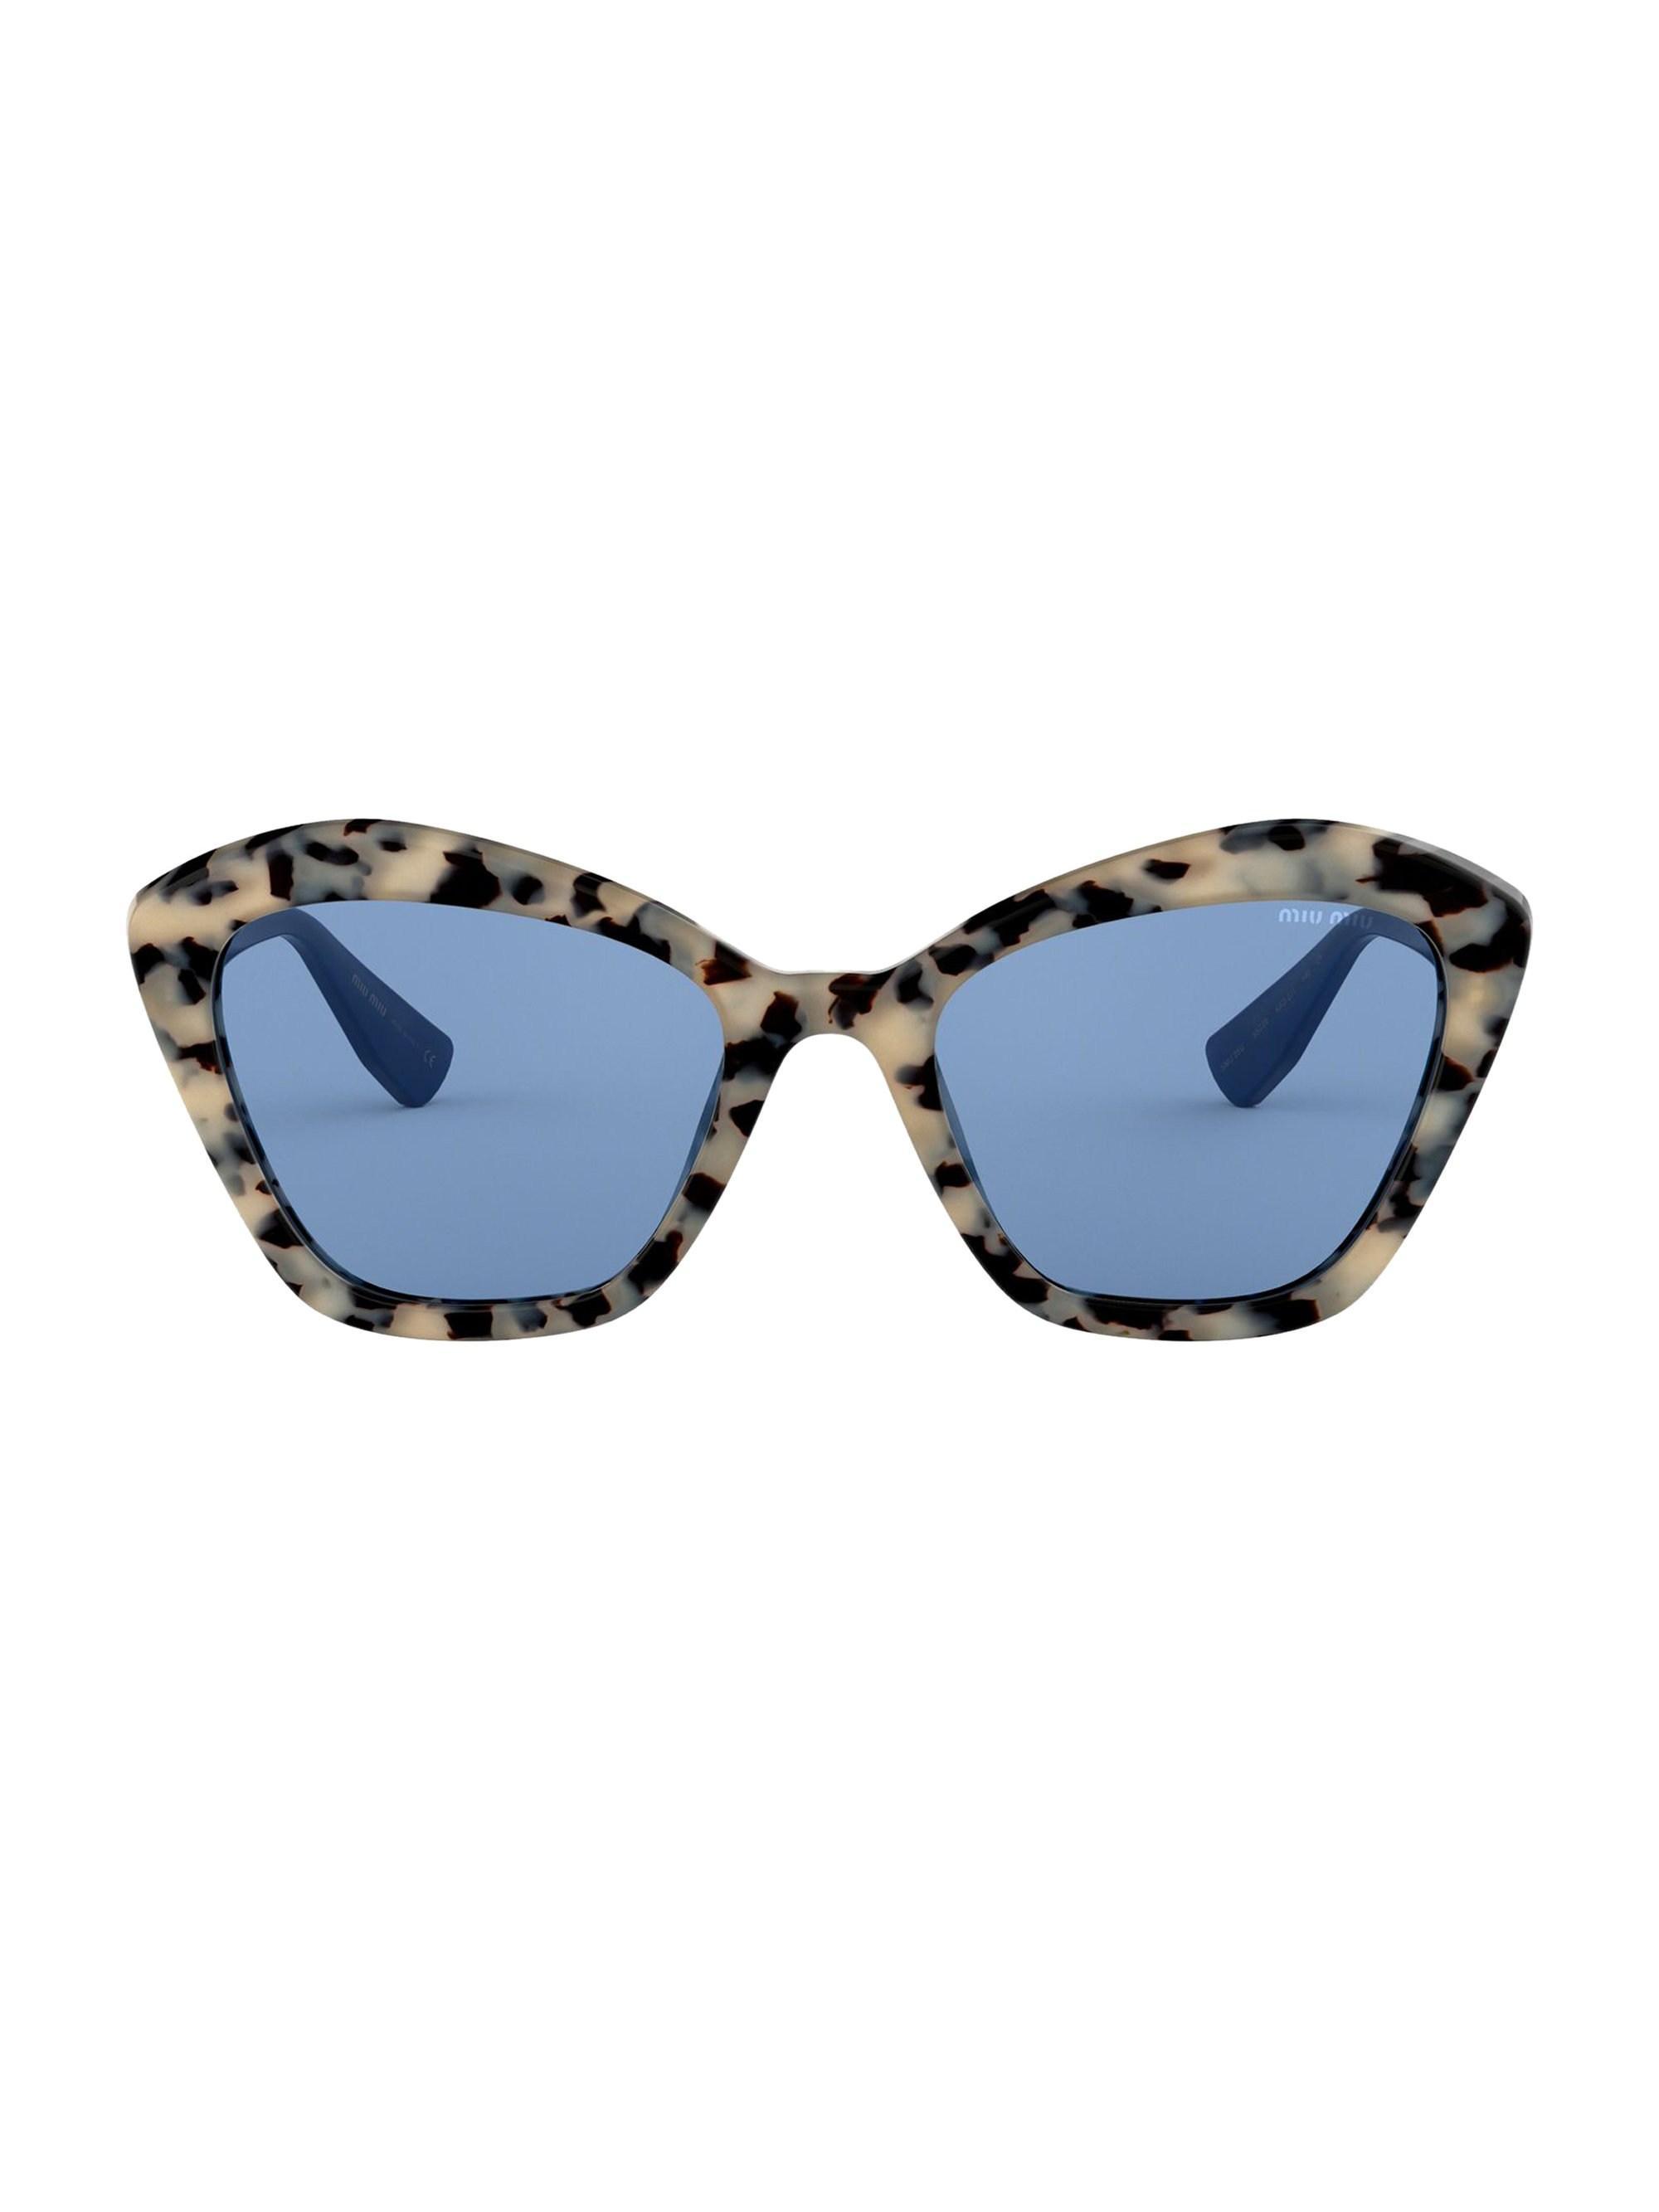 bb37c8cc2e3 Lyst - Miu Miu Women s 0mu 05us 55mm Cat Eye Sunglasses - Havana in Blue